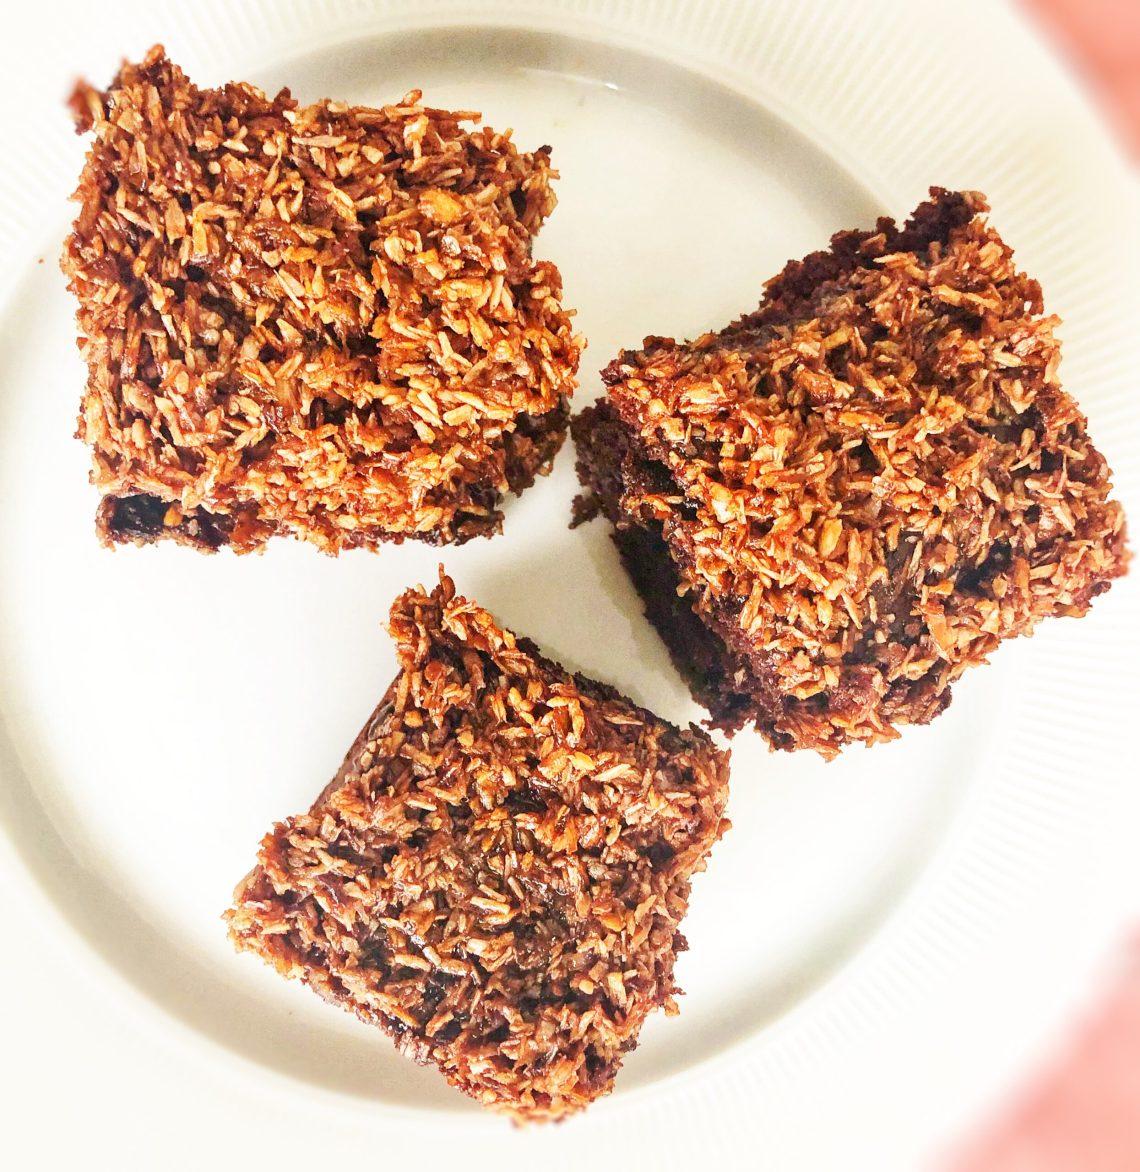 den-du-ved-nok chokoladekage